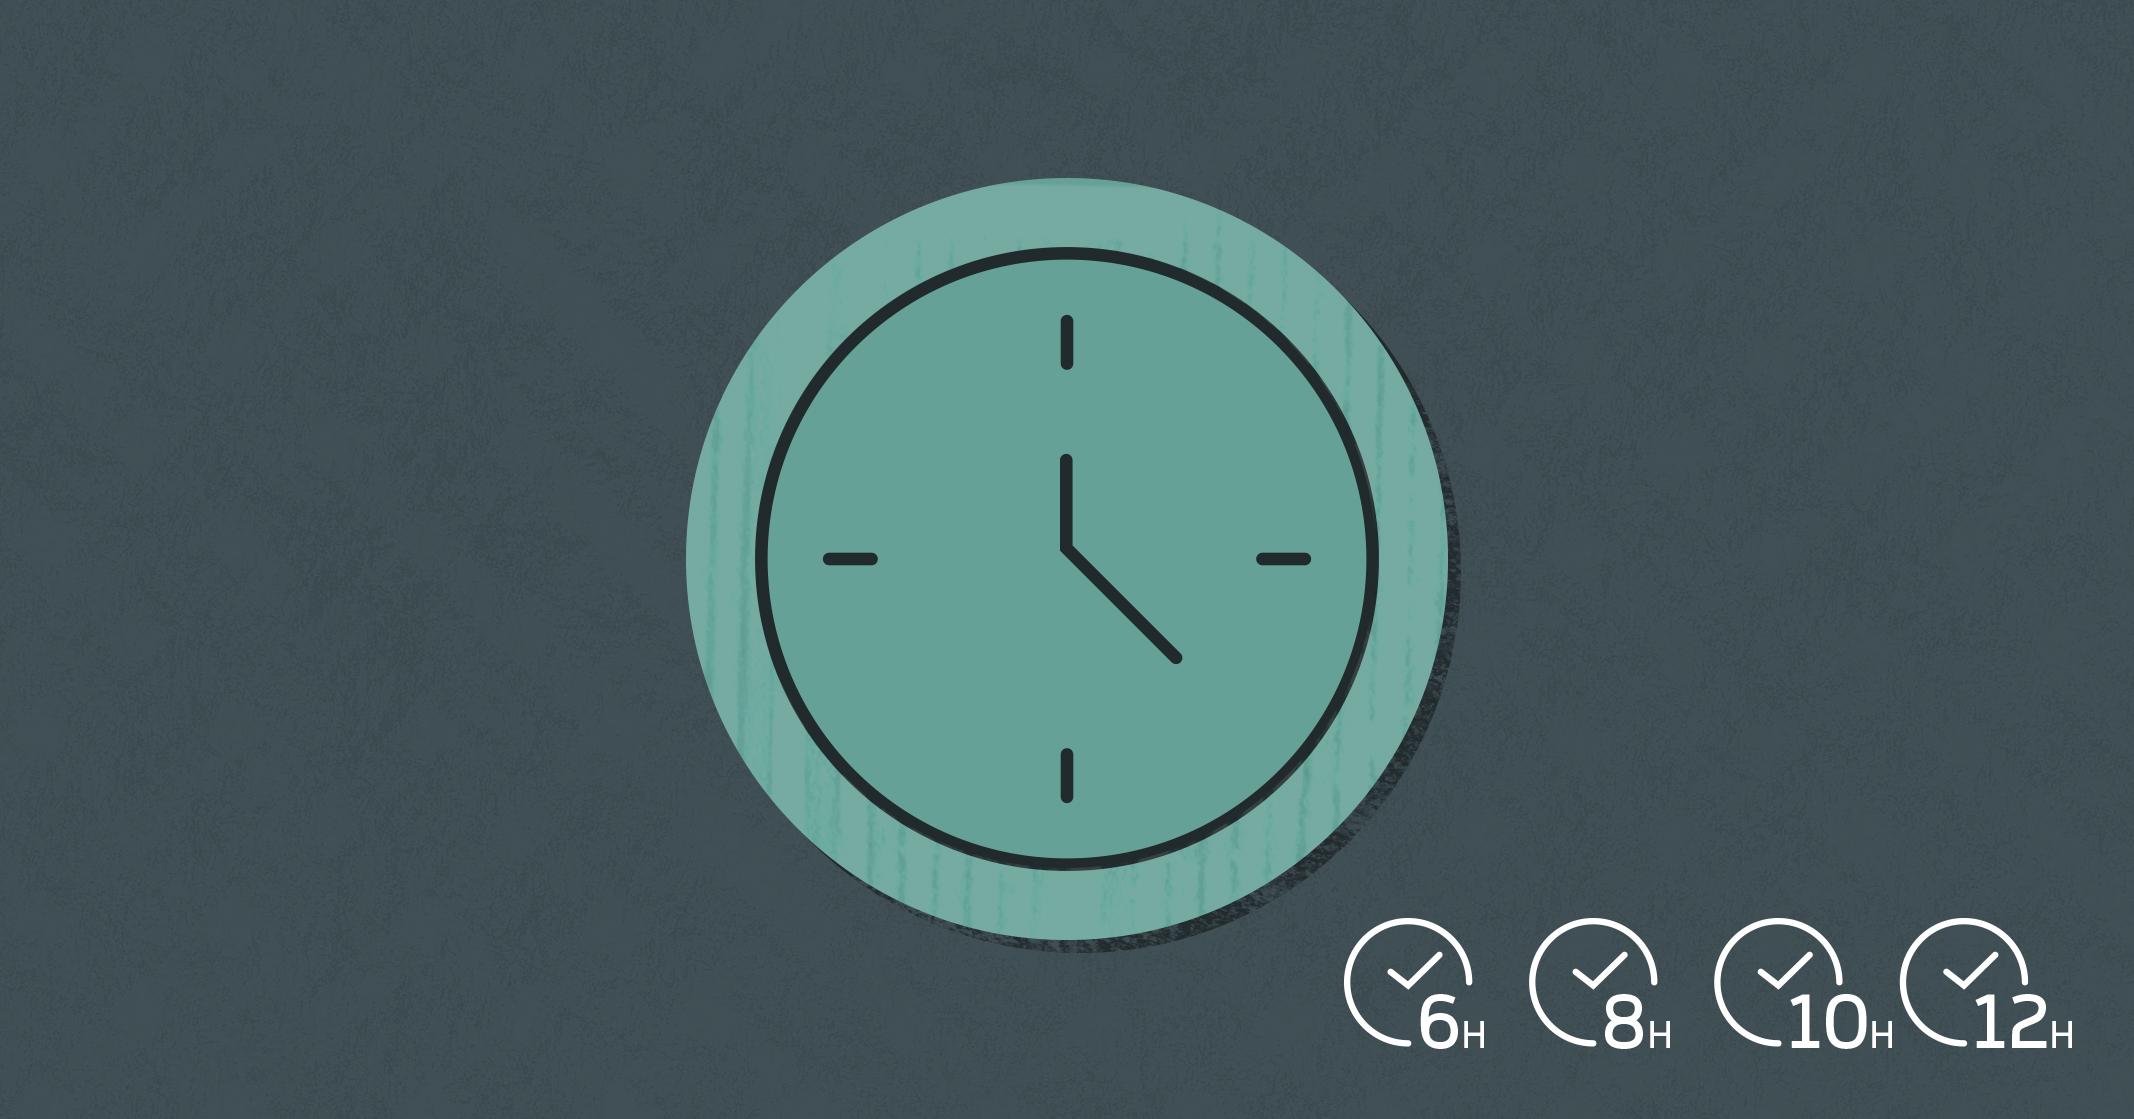 cp010_tempo_10.jpg.jpg